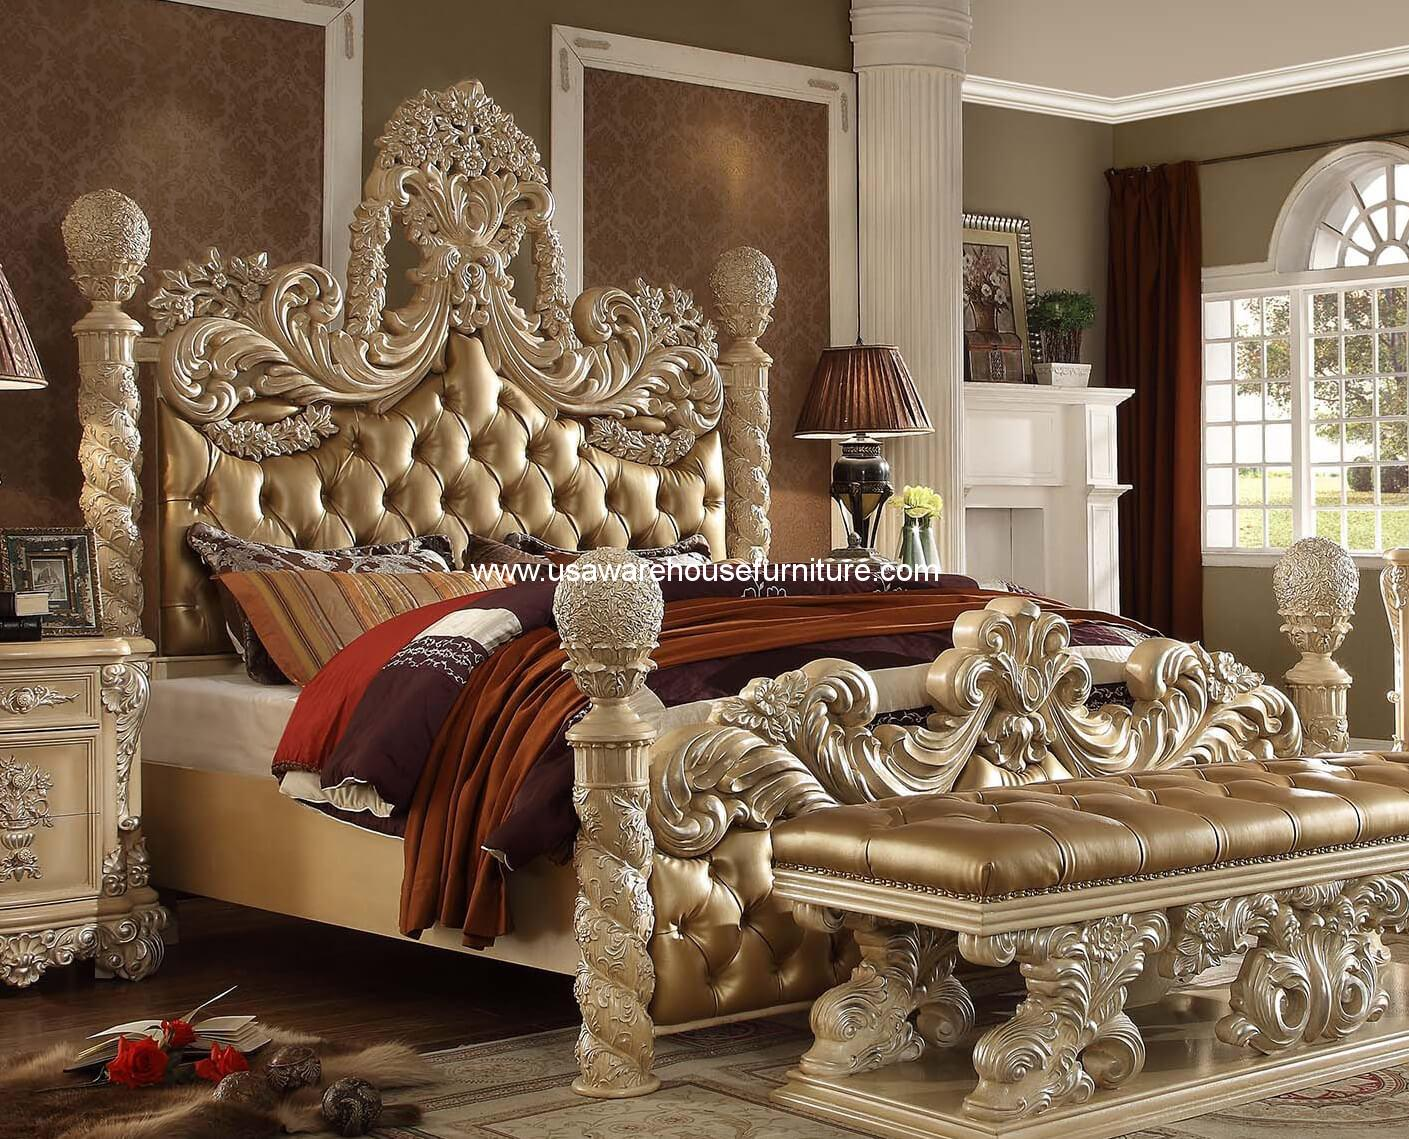 Victorian Palace Hd 7266 Bed Usa Warehouse Furniture